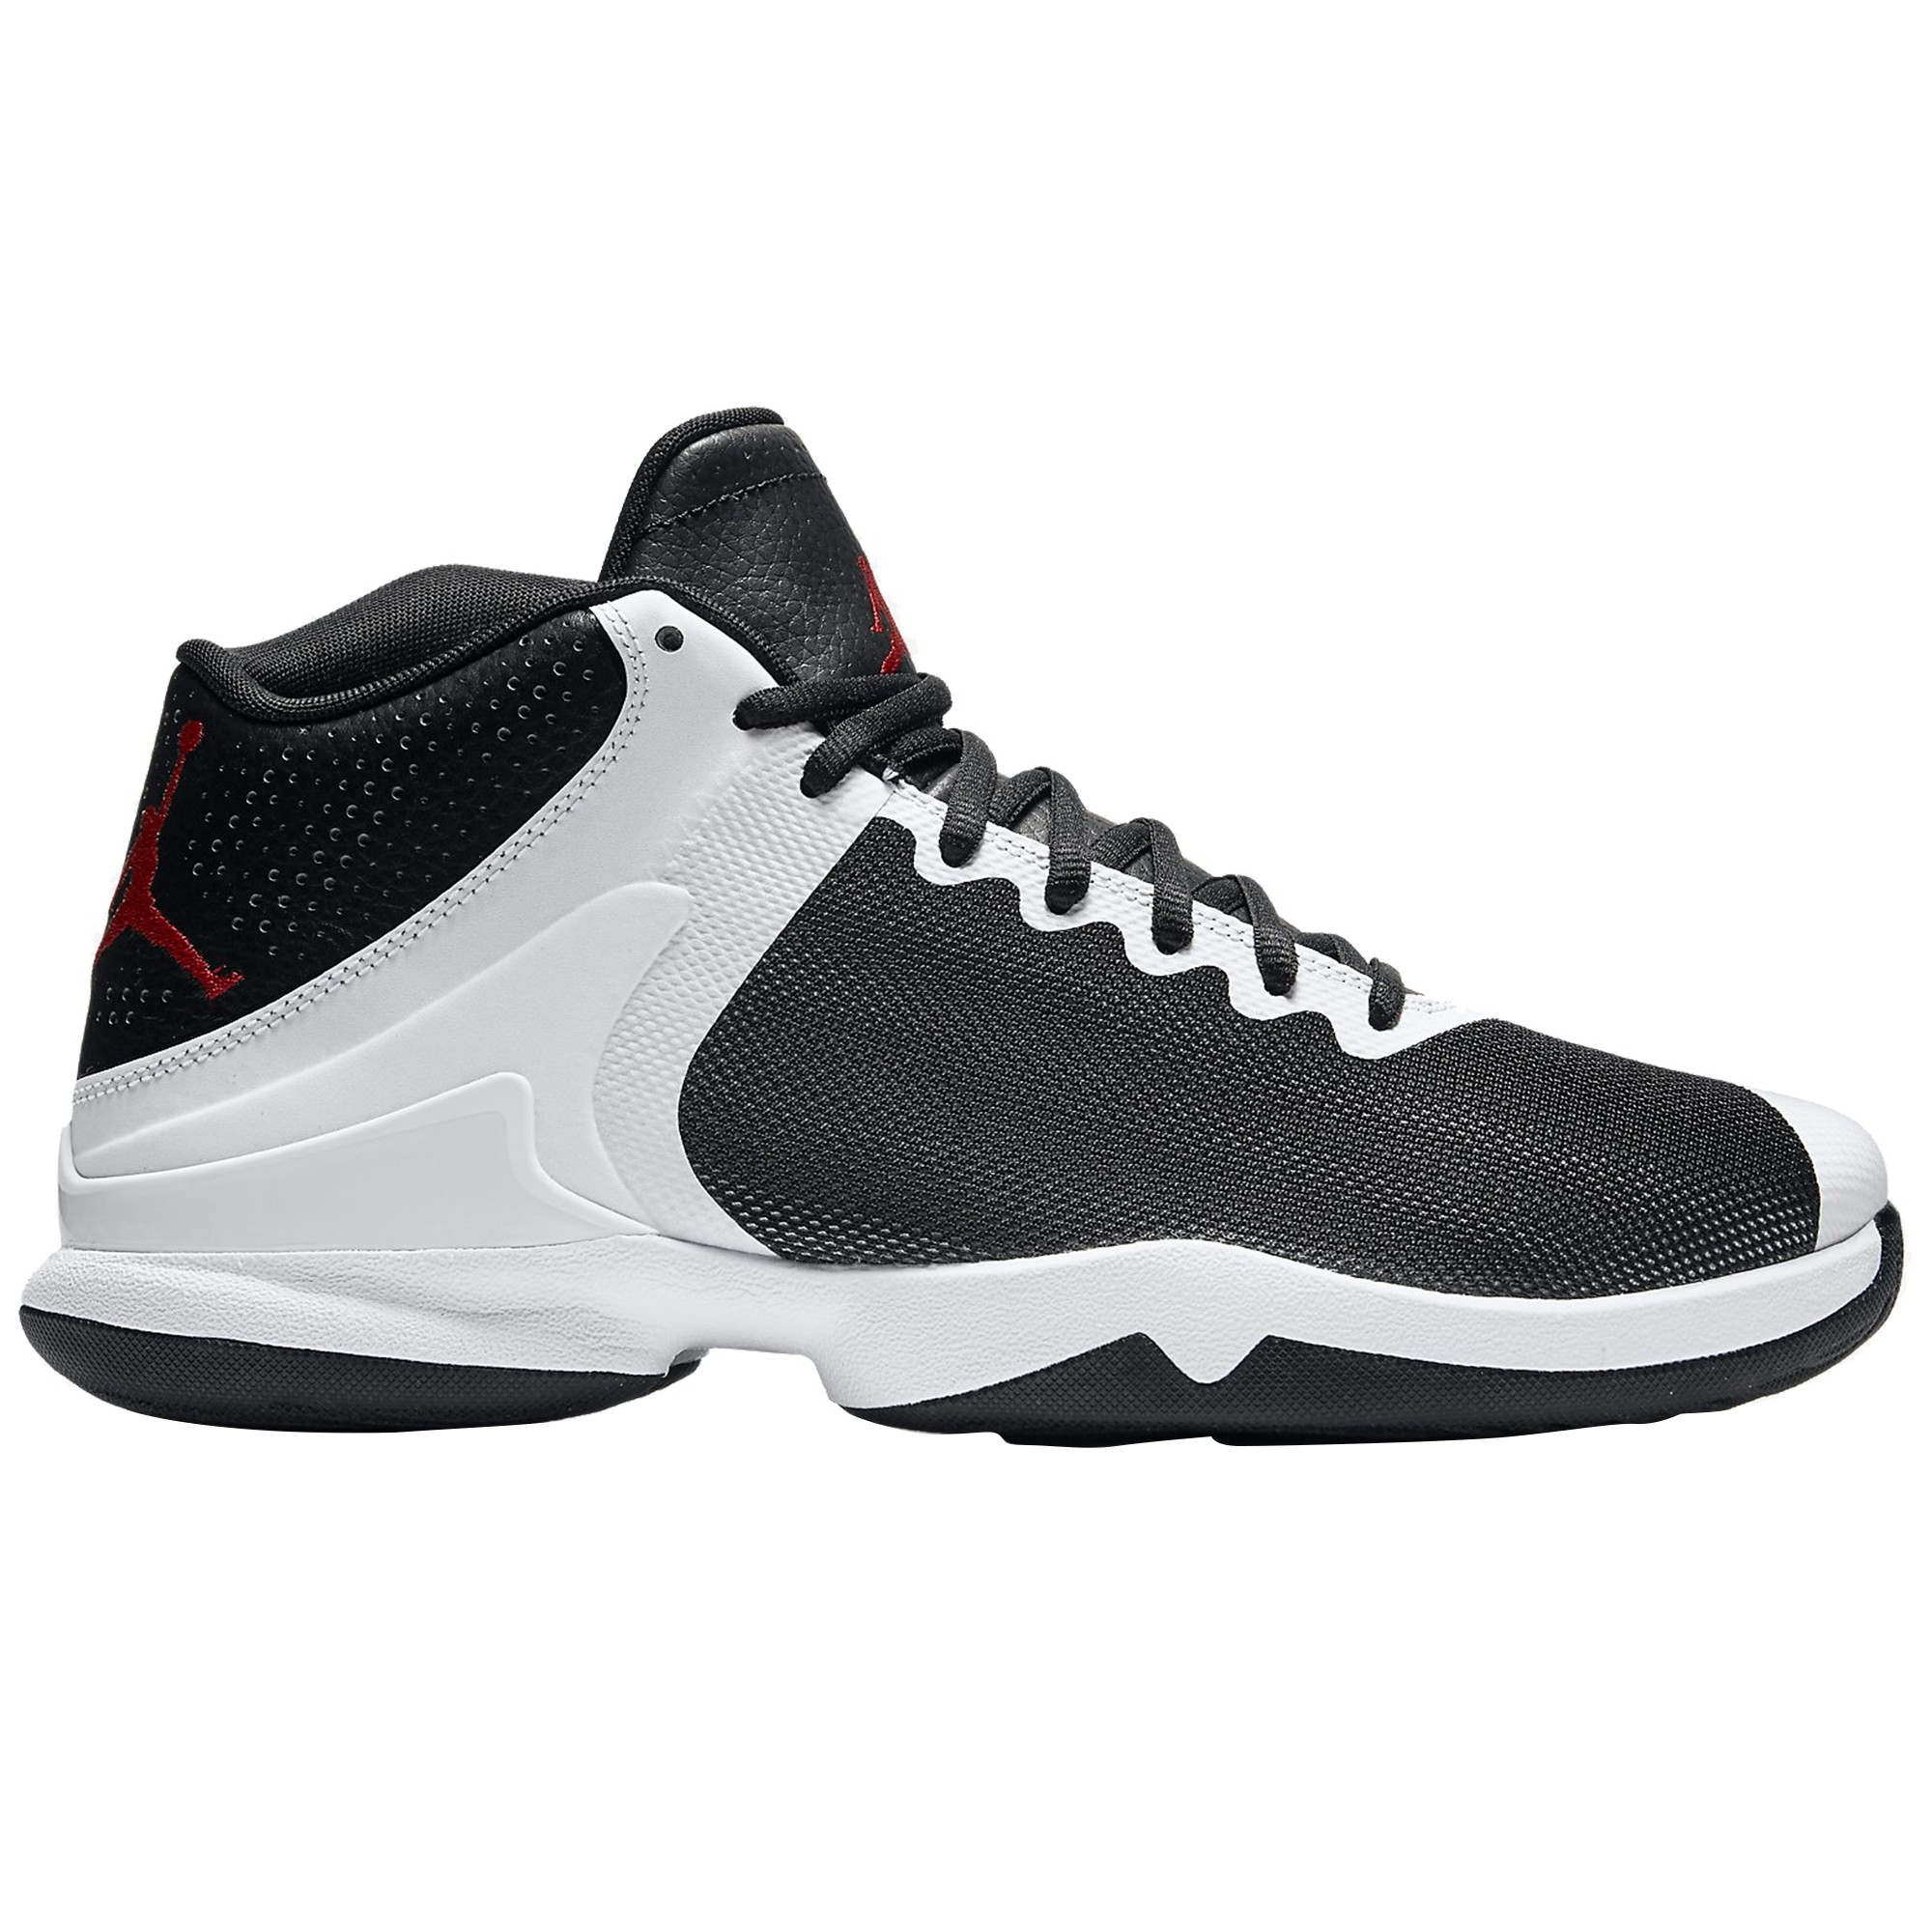 hot sales 6b4ec c6a52 Nike Air Jordan Super Fly 4 SS16 Erkek Basketbol Ayakkabısı